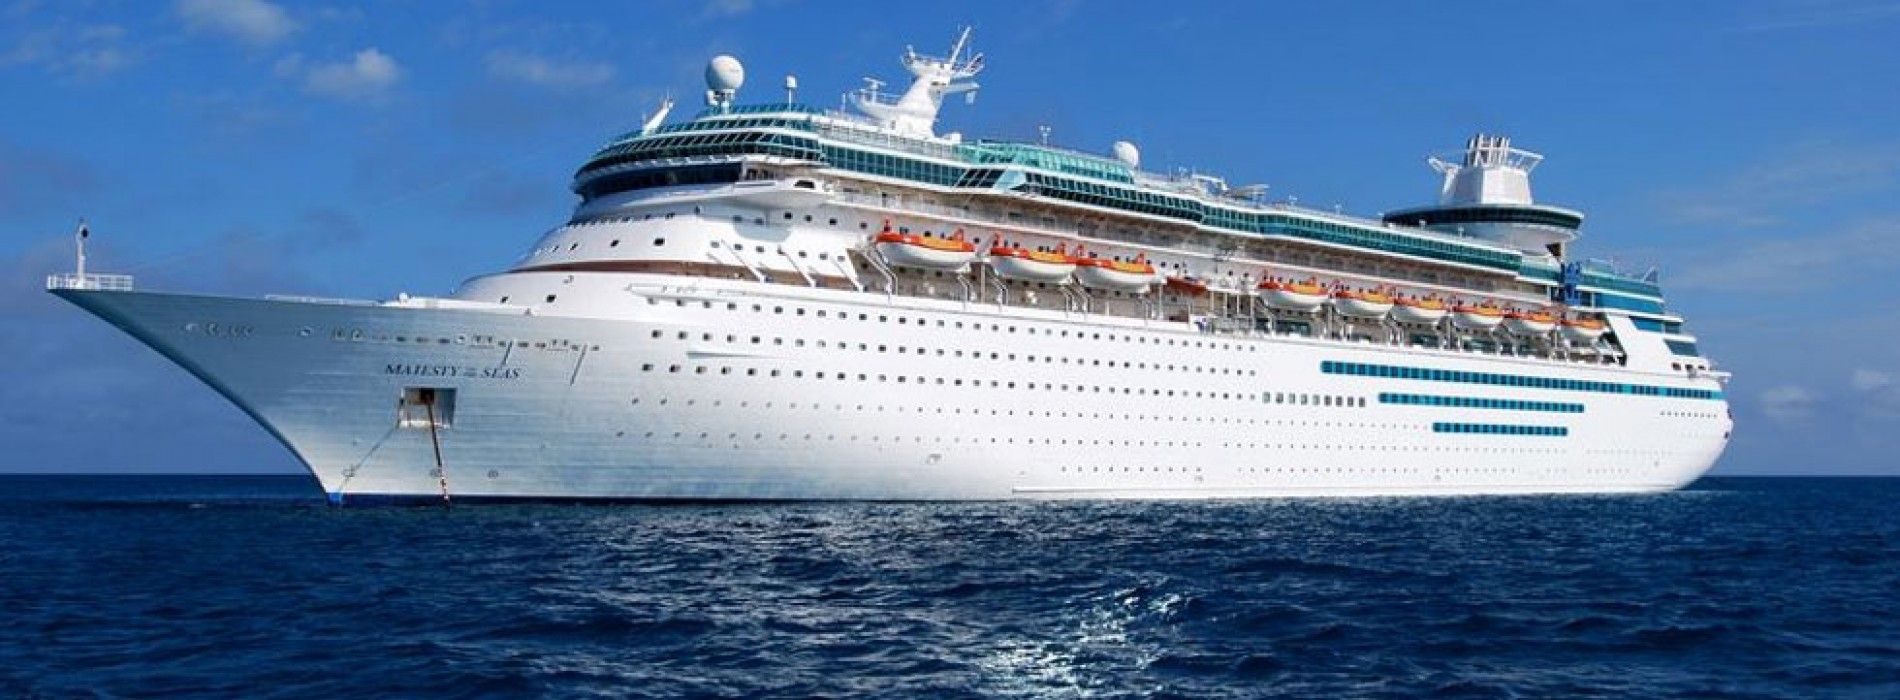 New president for P&O Cruises Australia